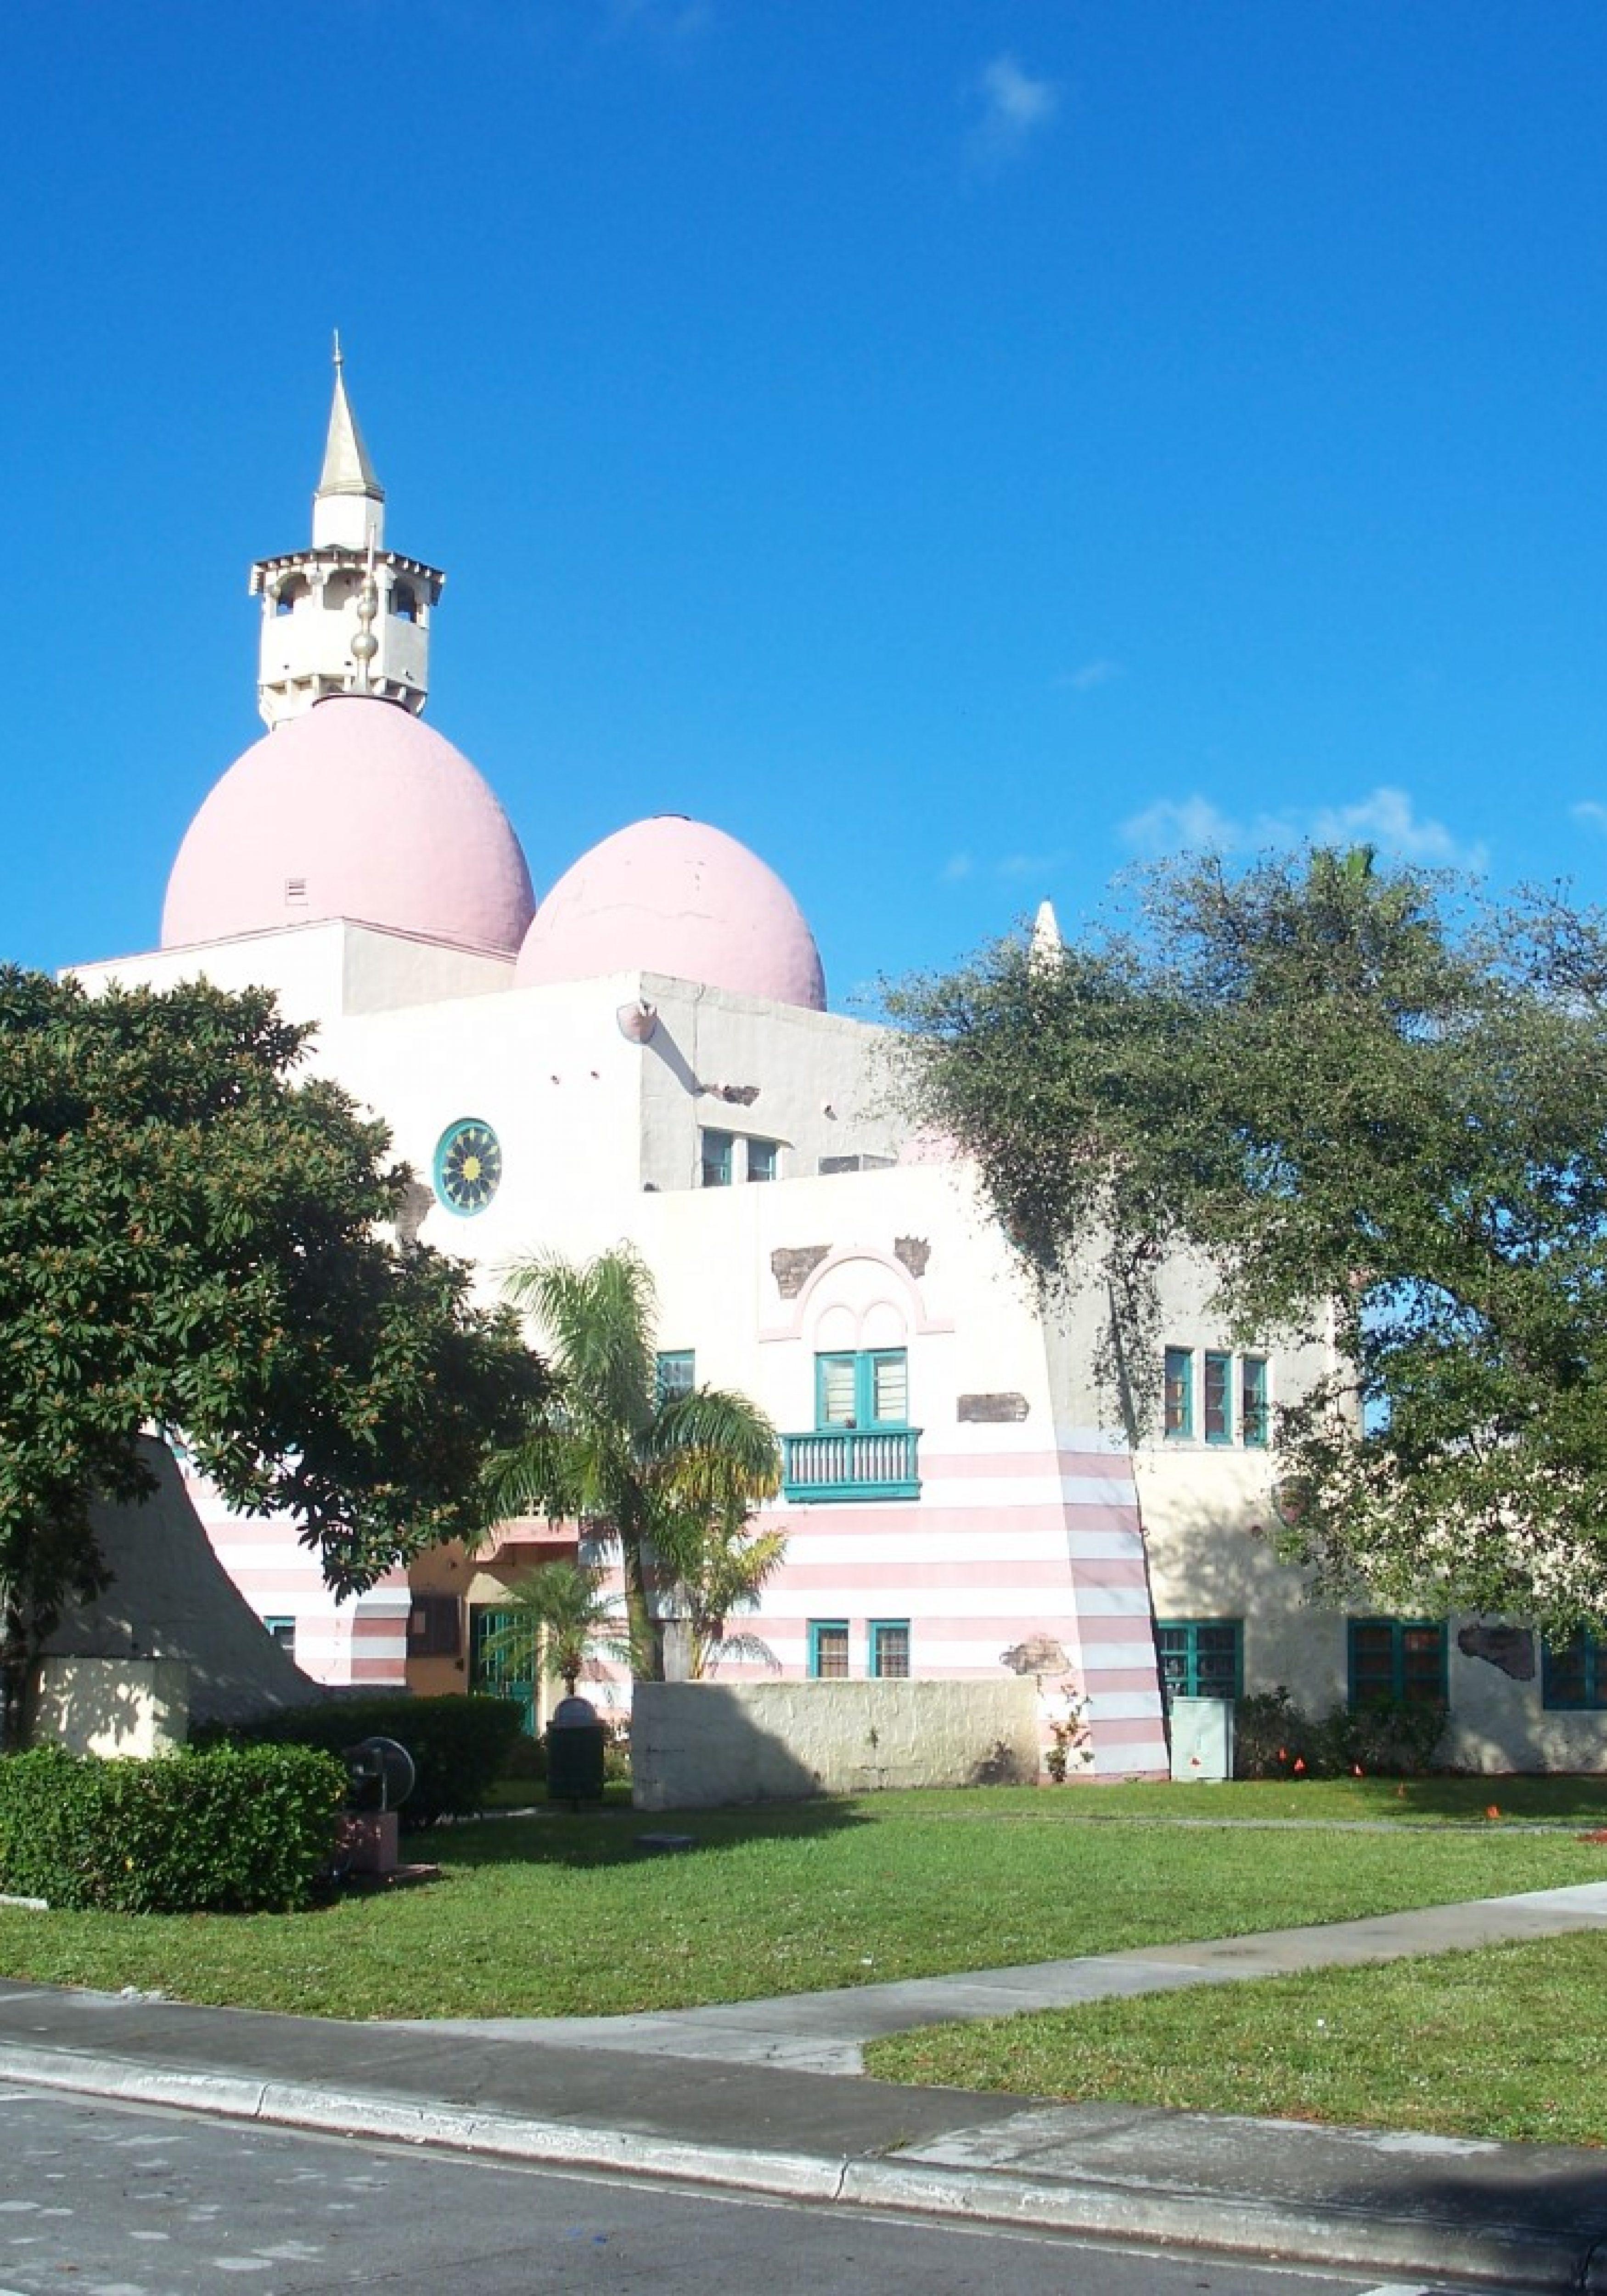 Opa_Locka_FL_city_hall02-Large-3500x5000.jpg